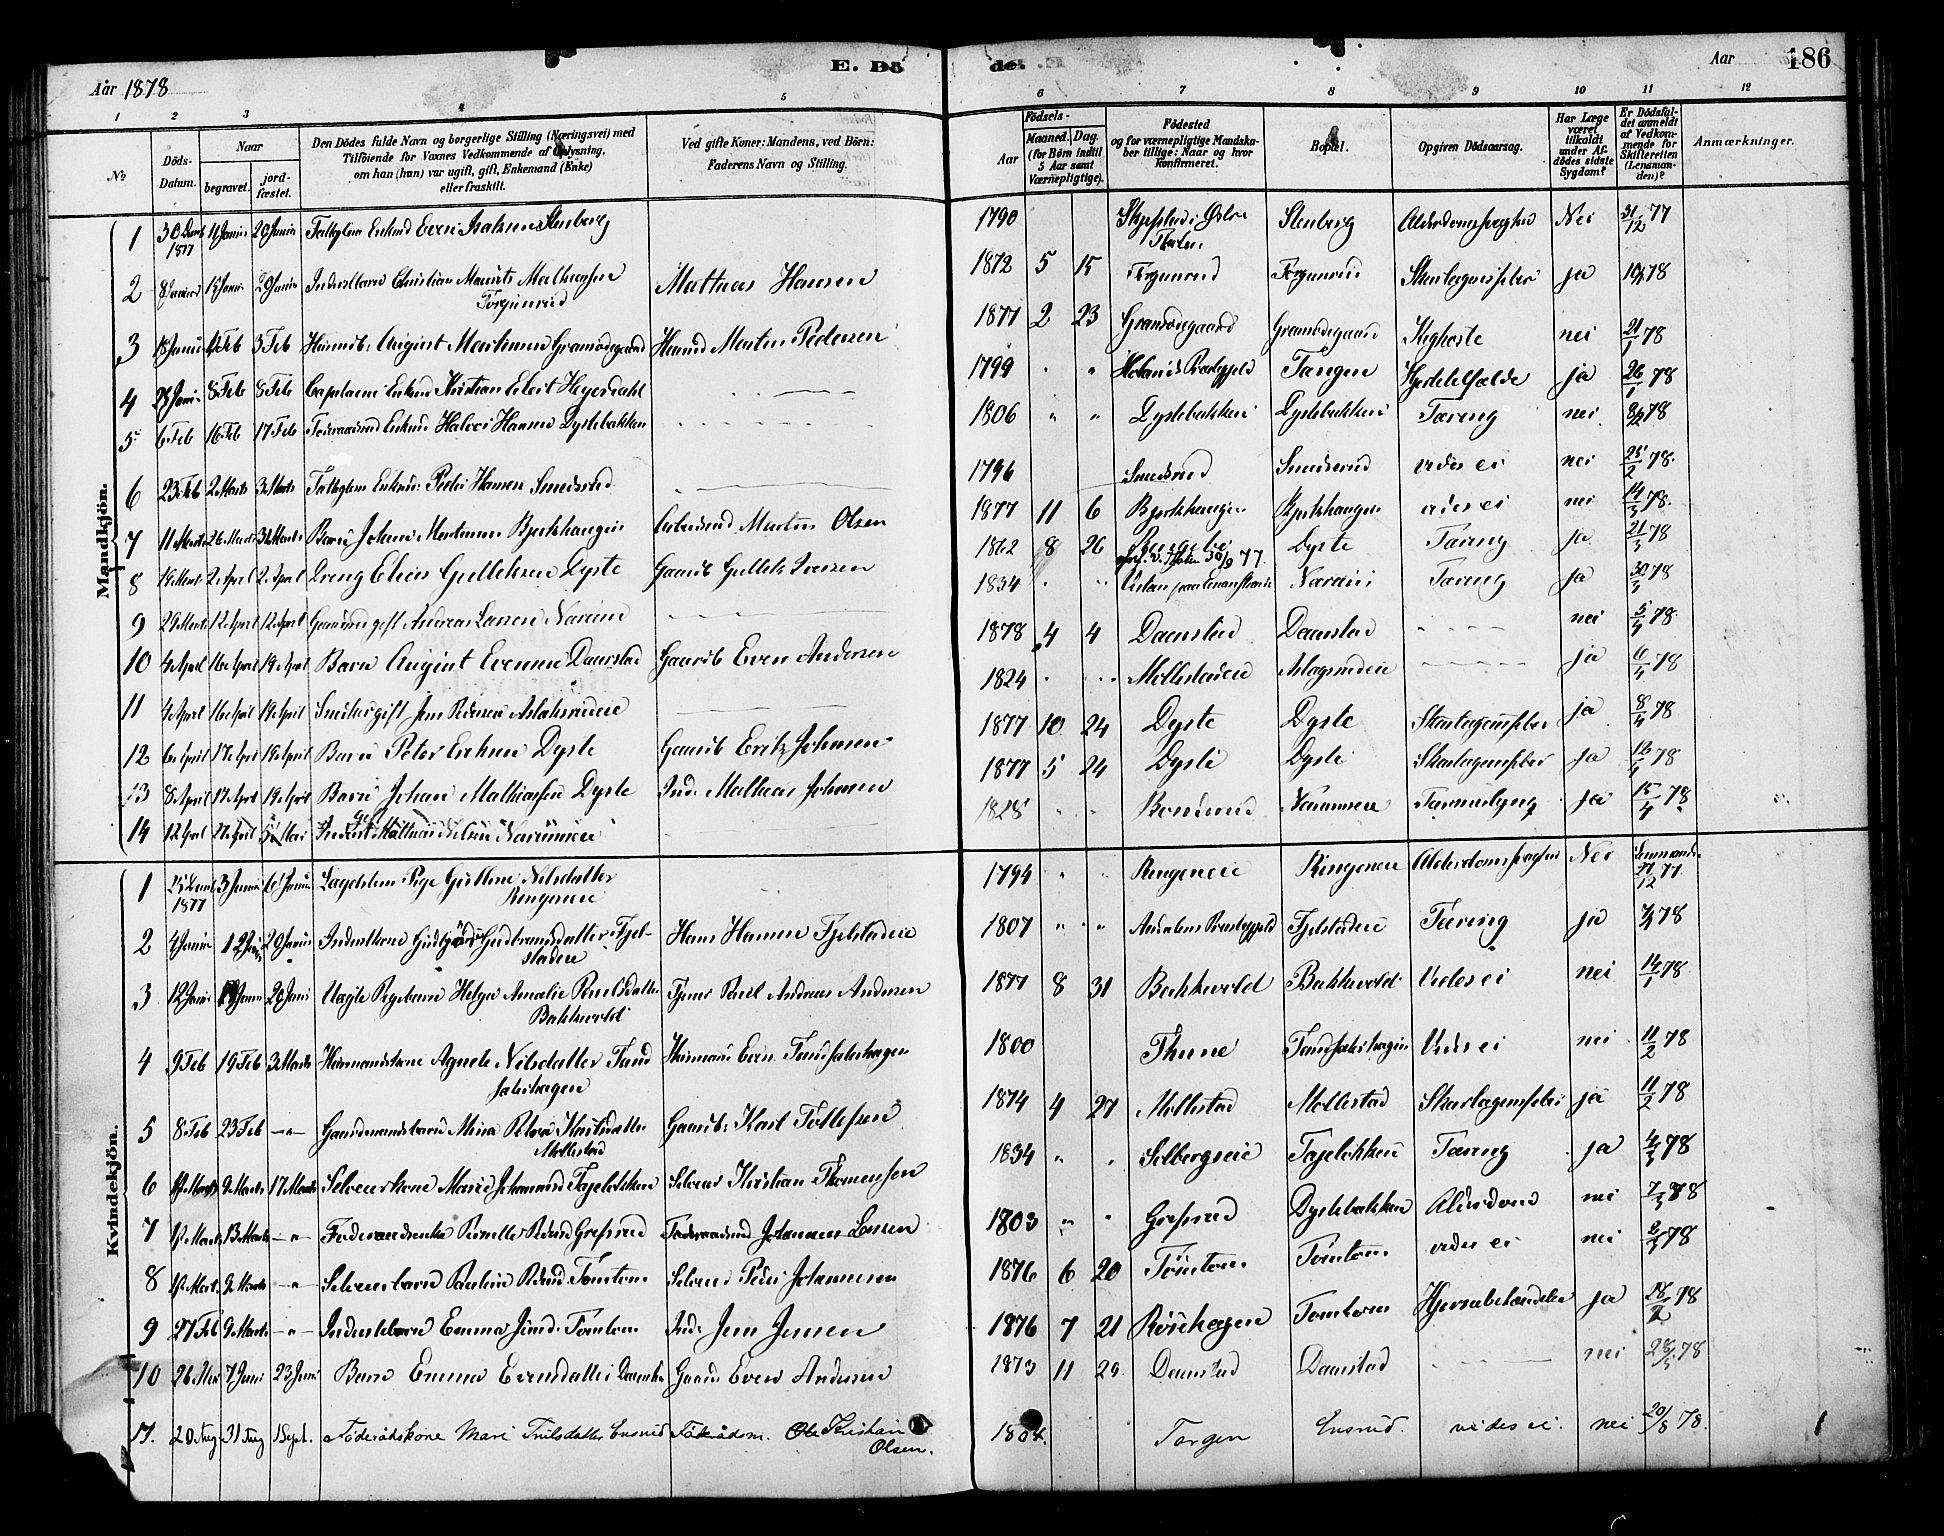 SAH, Vestre Toten prestekontor, H/Ha/Haa/L0010: Ministerialbok nr. 10, 1878-1894, s. 186